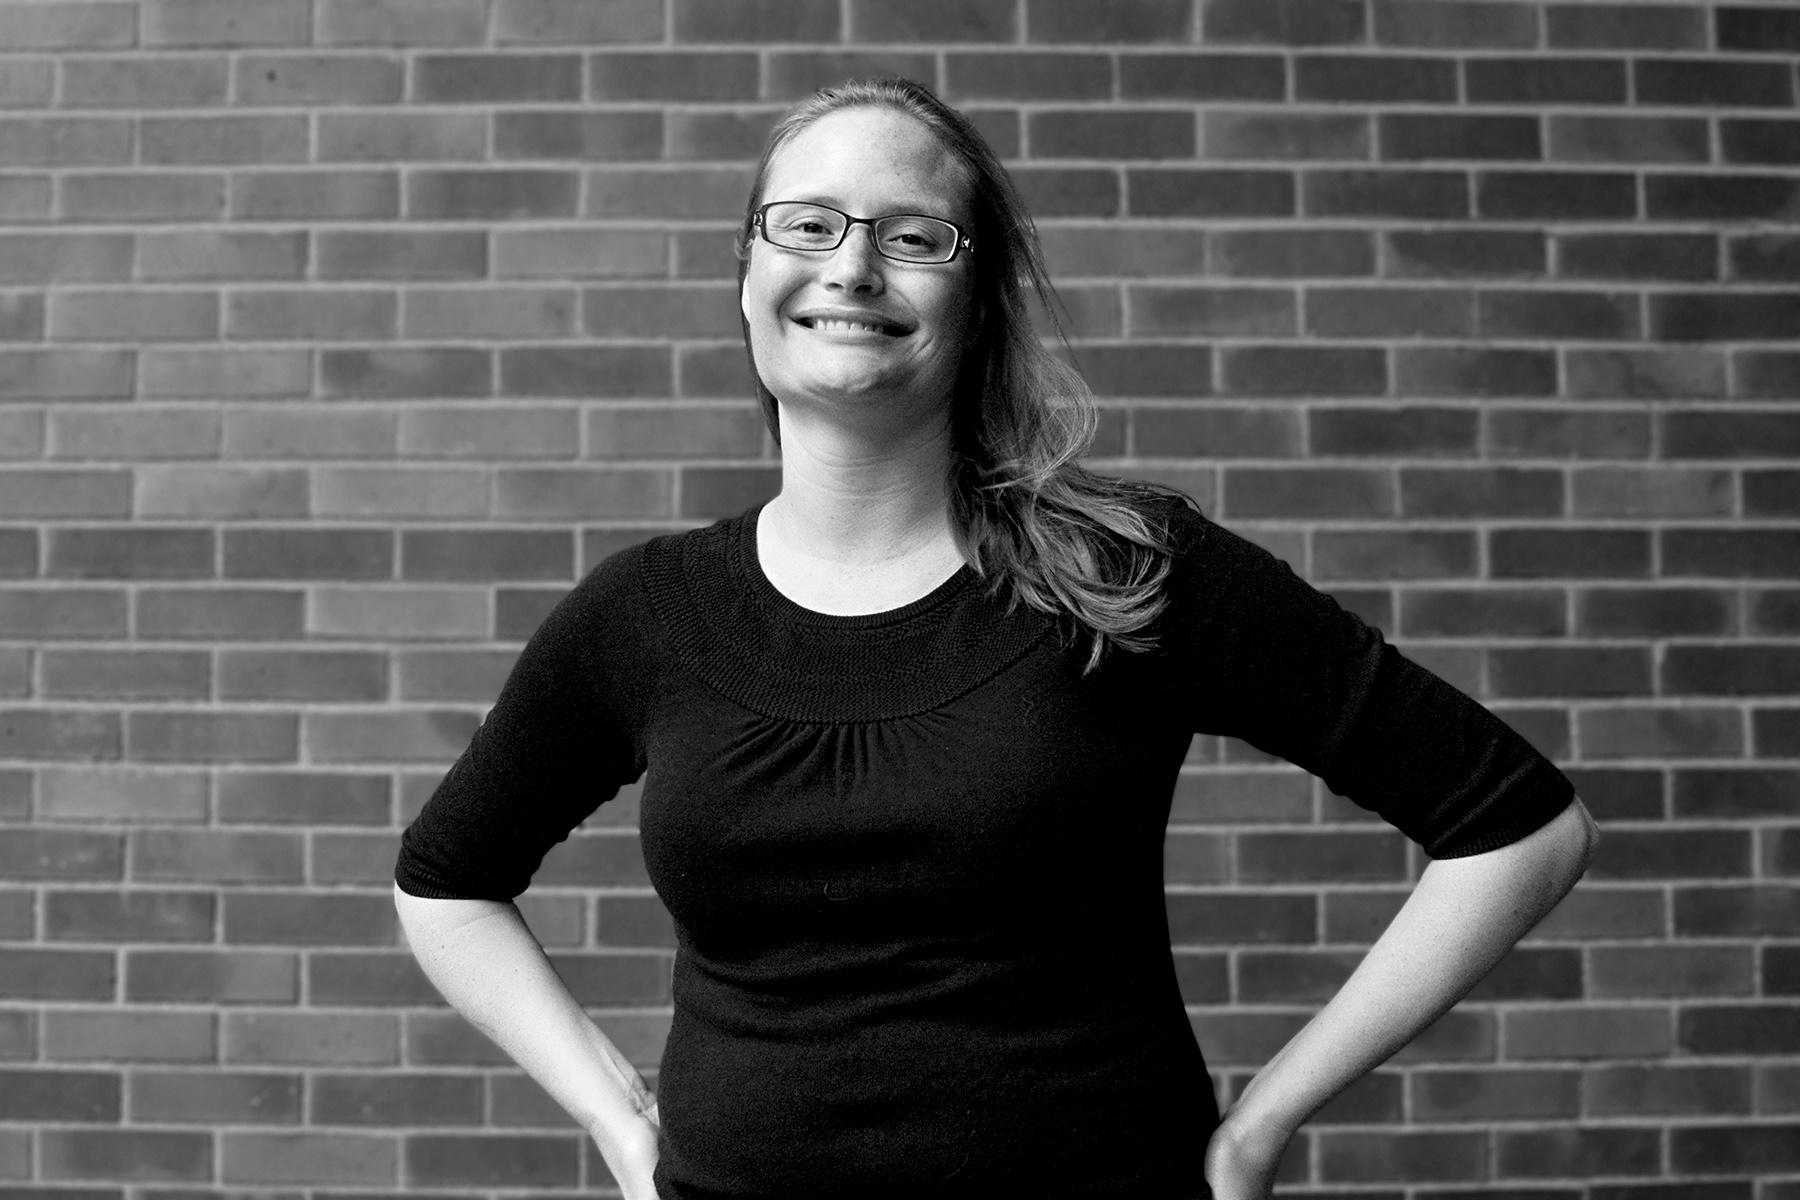 Zoe Donaldson. AA Simon's Rock College, BS UCLA, PhD Emory University, Post doc Columbia University. Current: assistant professor of neuroscience, University of Colorado, Boulder